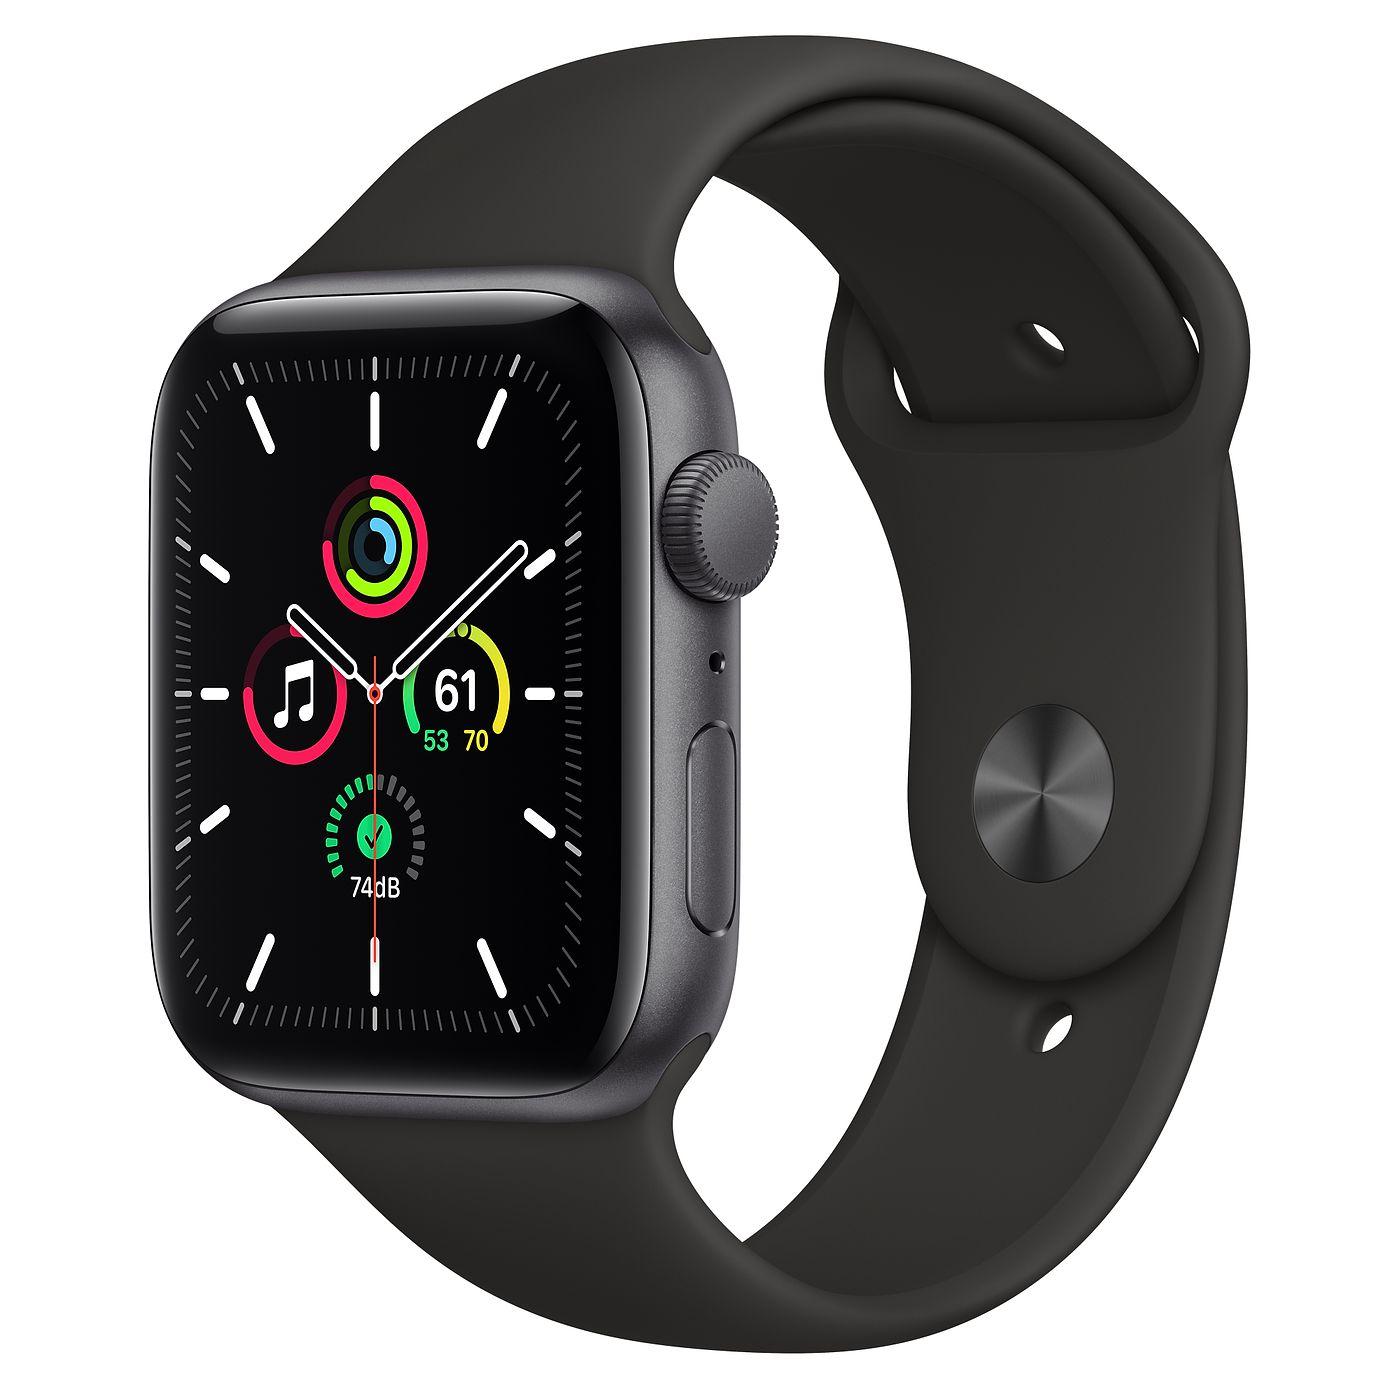 Apple 2020년 애플워치 SE GPS 44mm 레귤러, 스페이스 그레이 알루미늄(케이스), 블랙(스포츠 밴드)